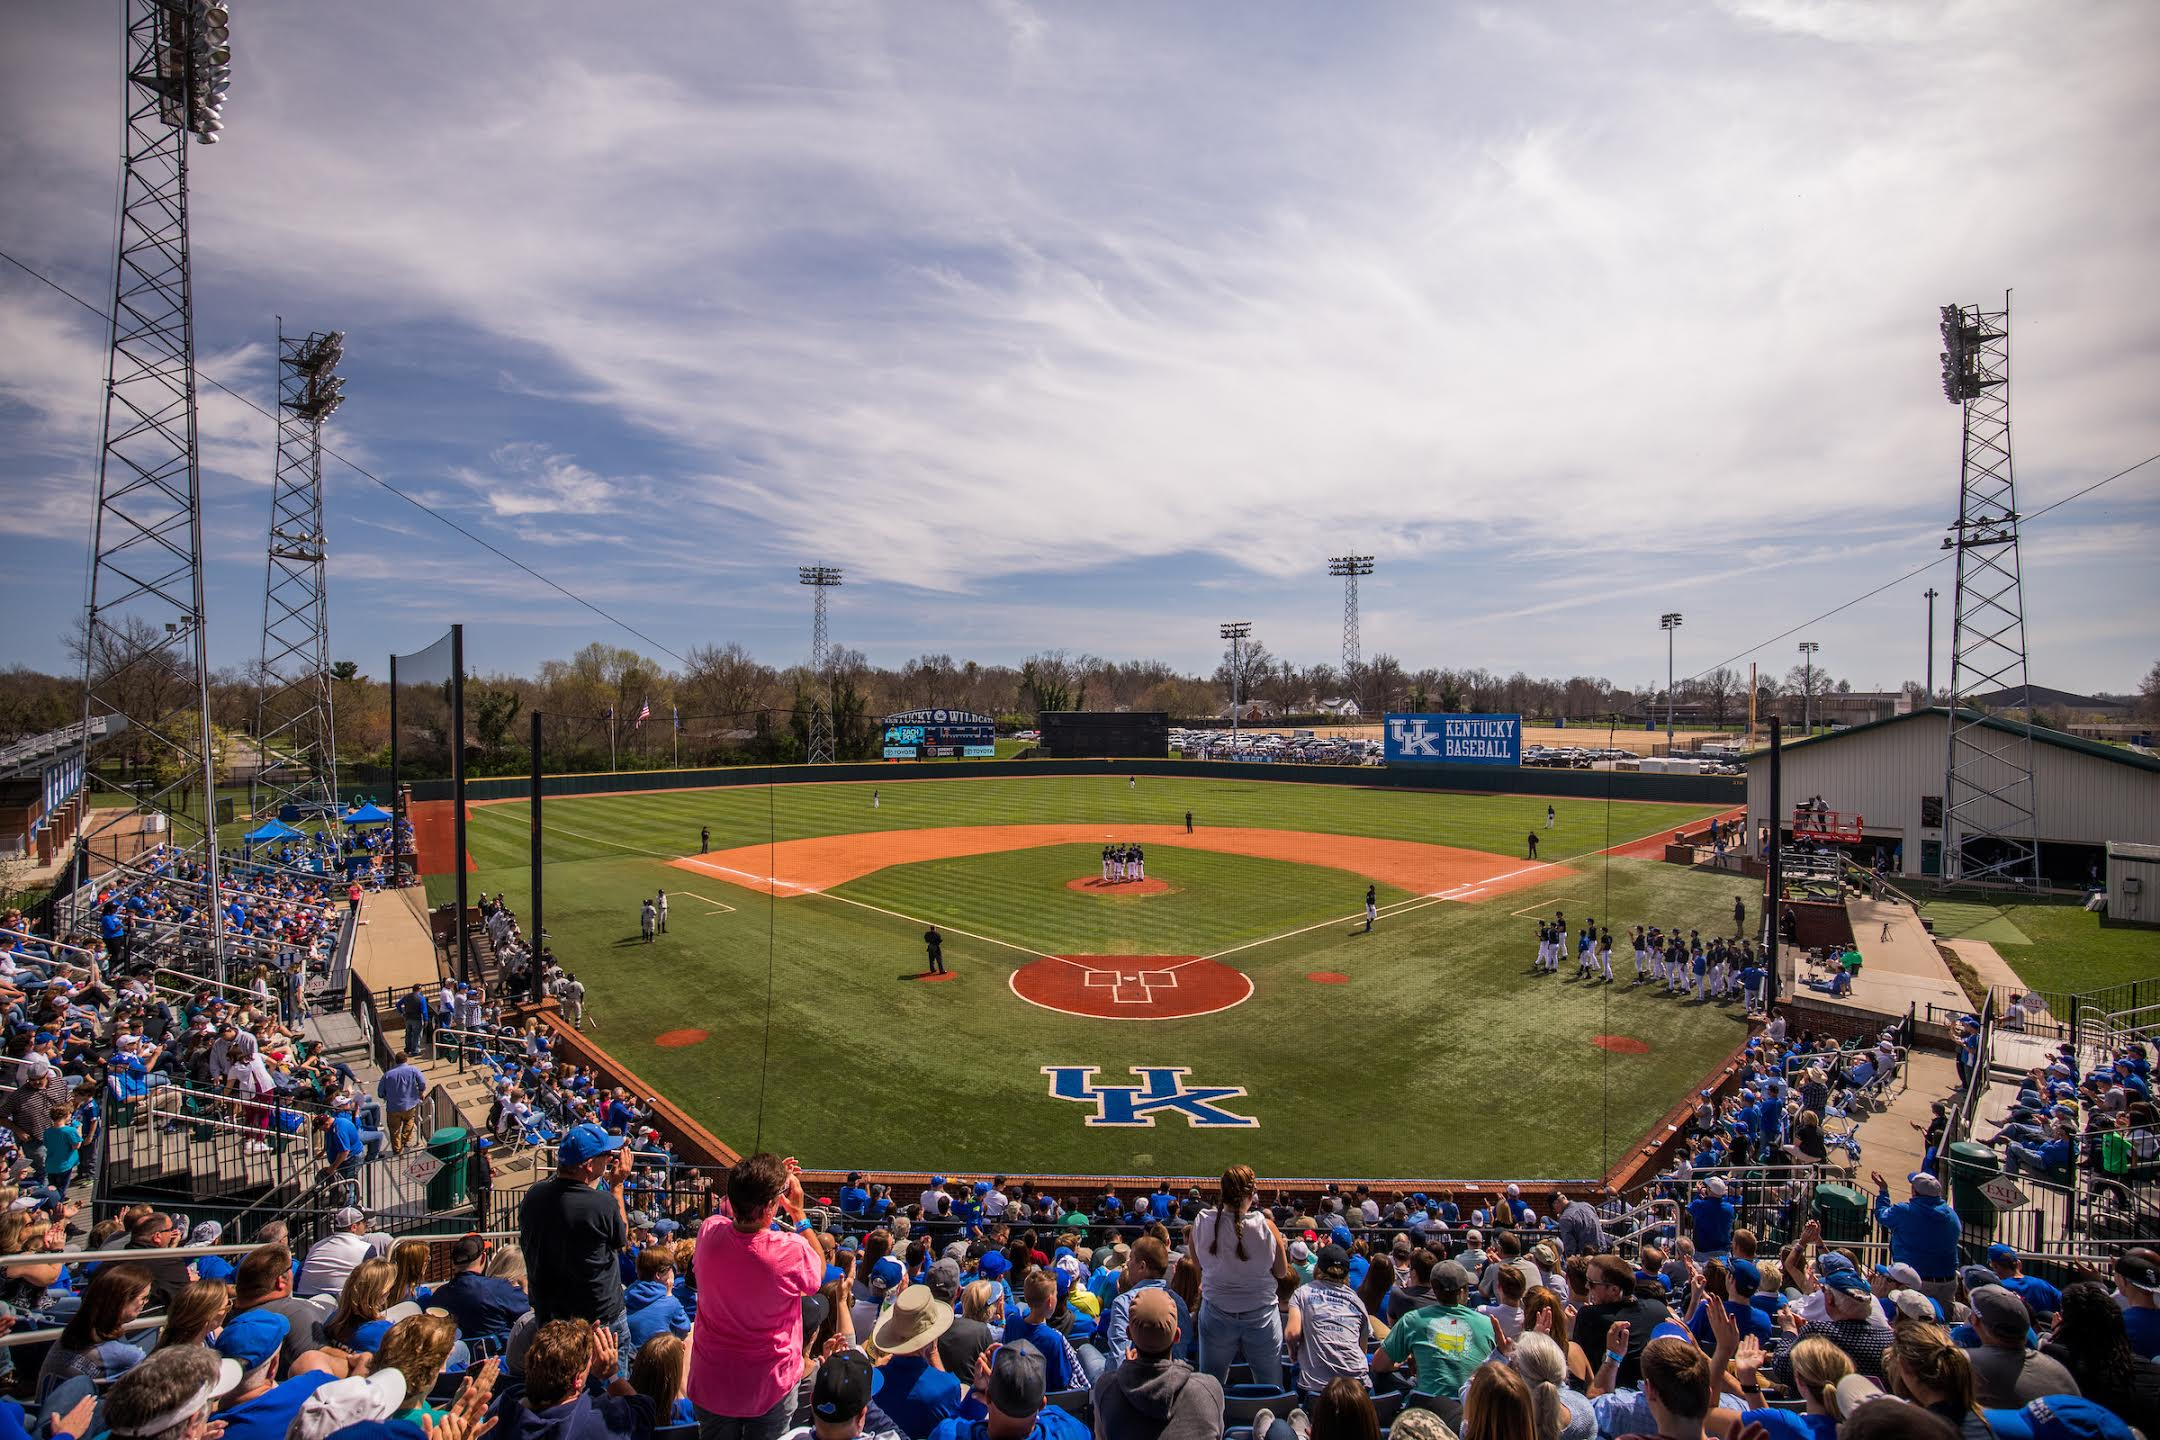 University of Kentucky baseball team falls to Vandy 6-4 on Sunday, April 2, 2017, in Lexington's Cliff Hagen Stadium.Photo by Elliott Hess | UK Athletics